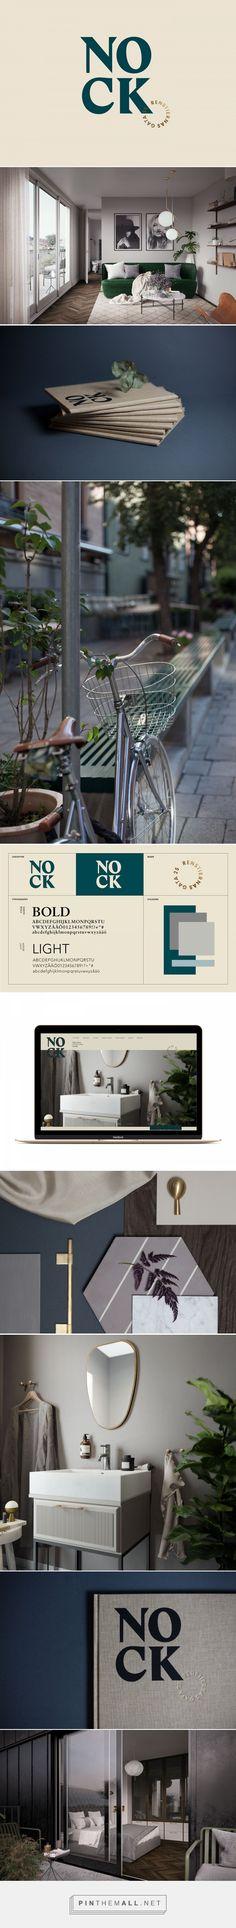 Nock on Behance. Brand design, logo design, web design, branding, visual identity #brandidentity